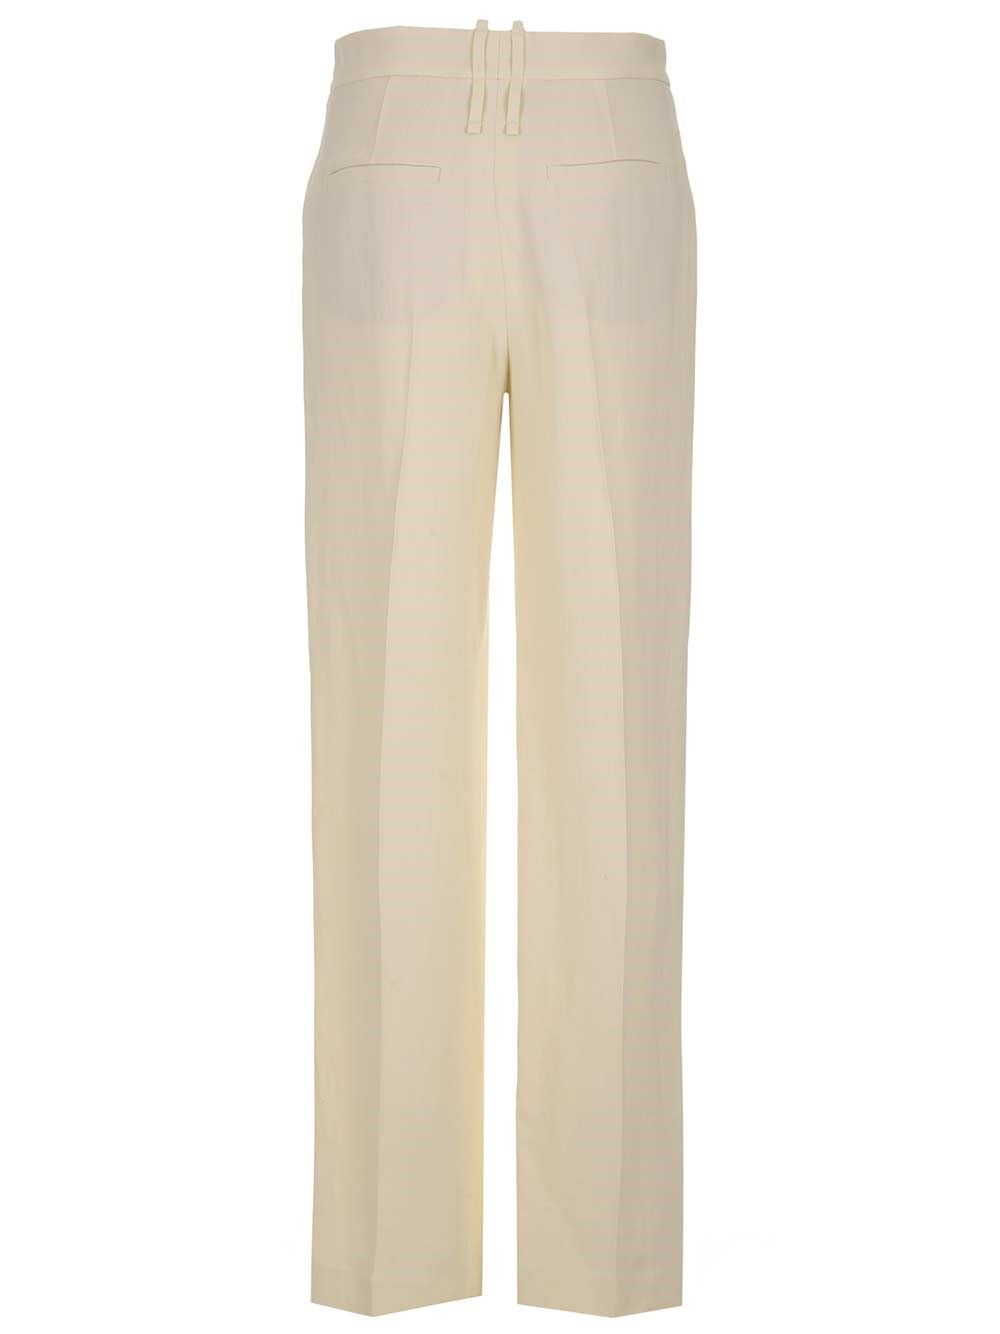 BRUNELLO CUCINELLI Cottons BRUNELLO CUCINELLI WOMEN'S WHITE OTHER MATERIALS PANTS